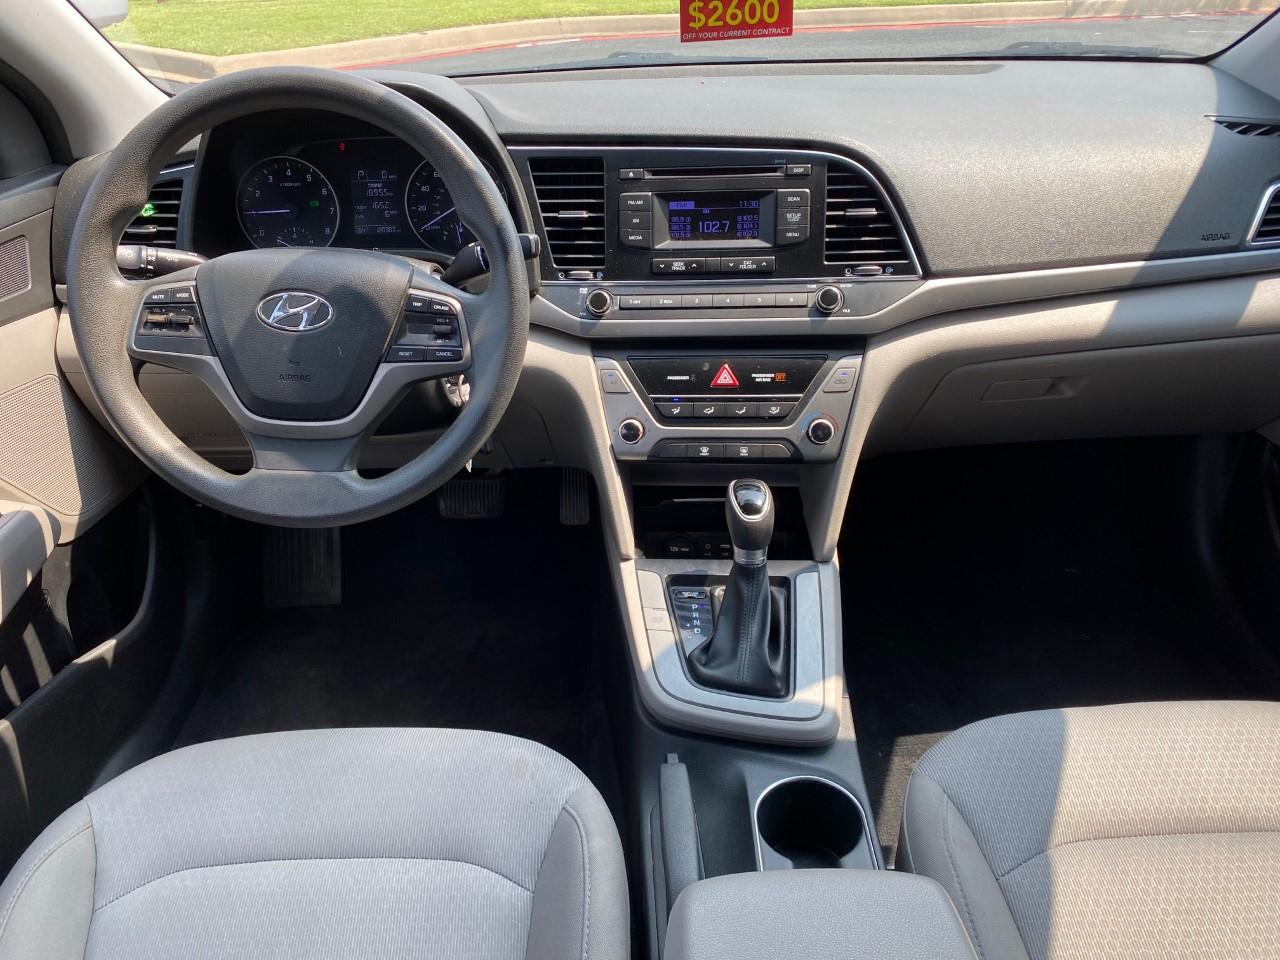 used vehicle - Sedan HYUNDAI ELANTRA 2017